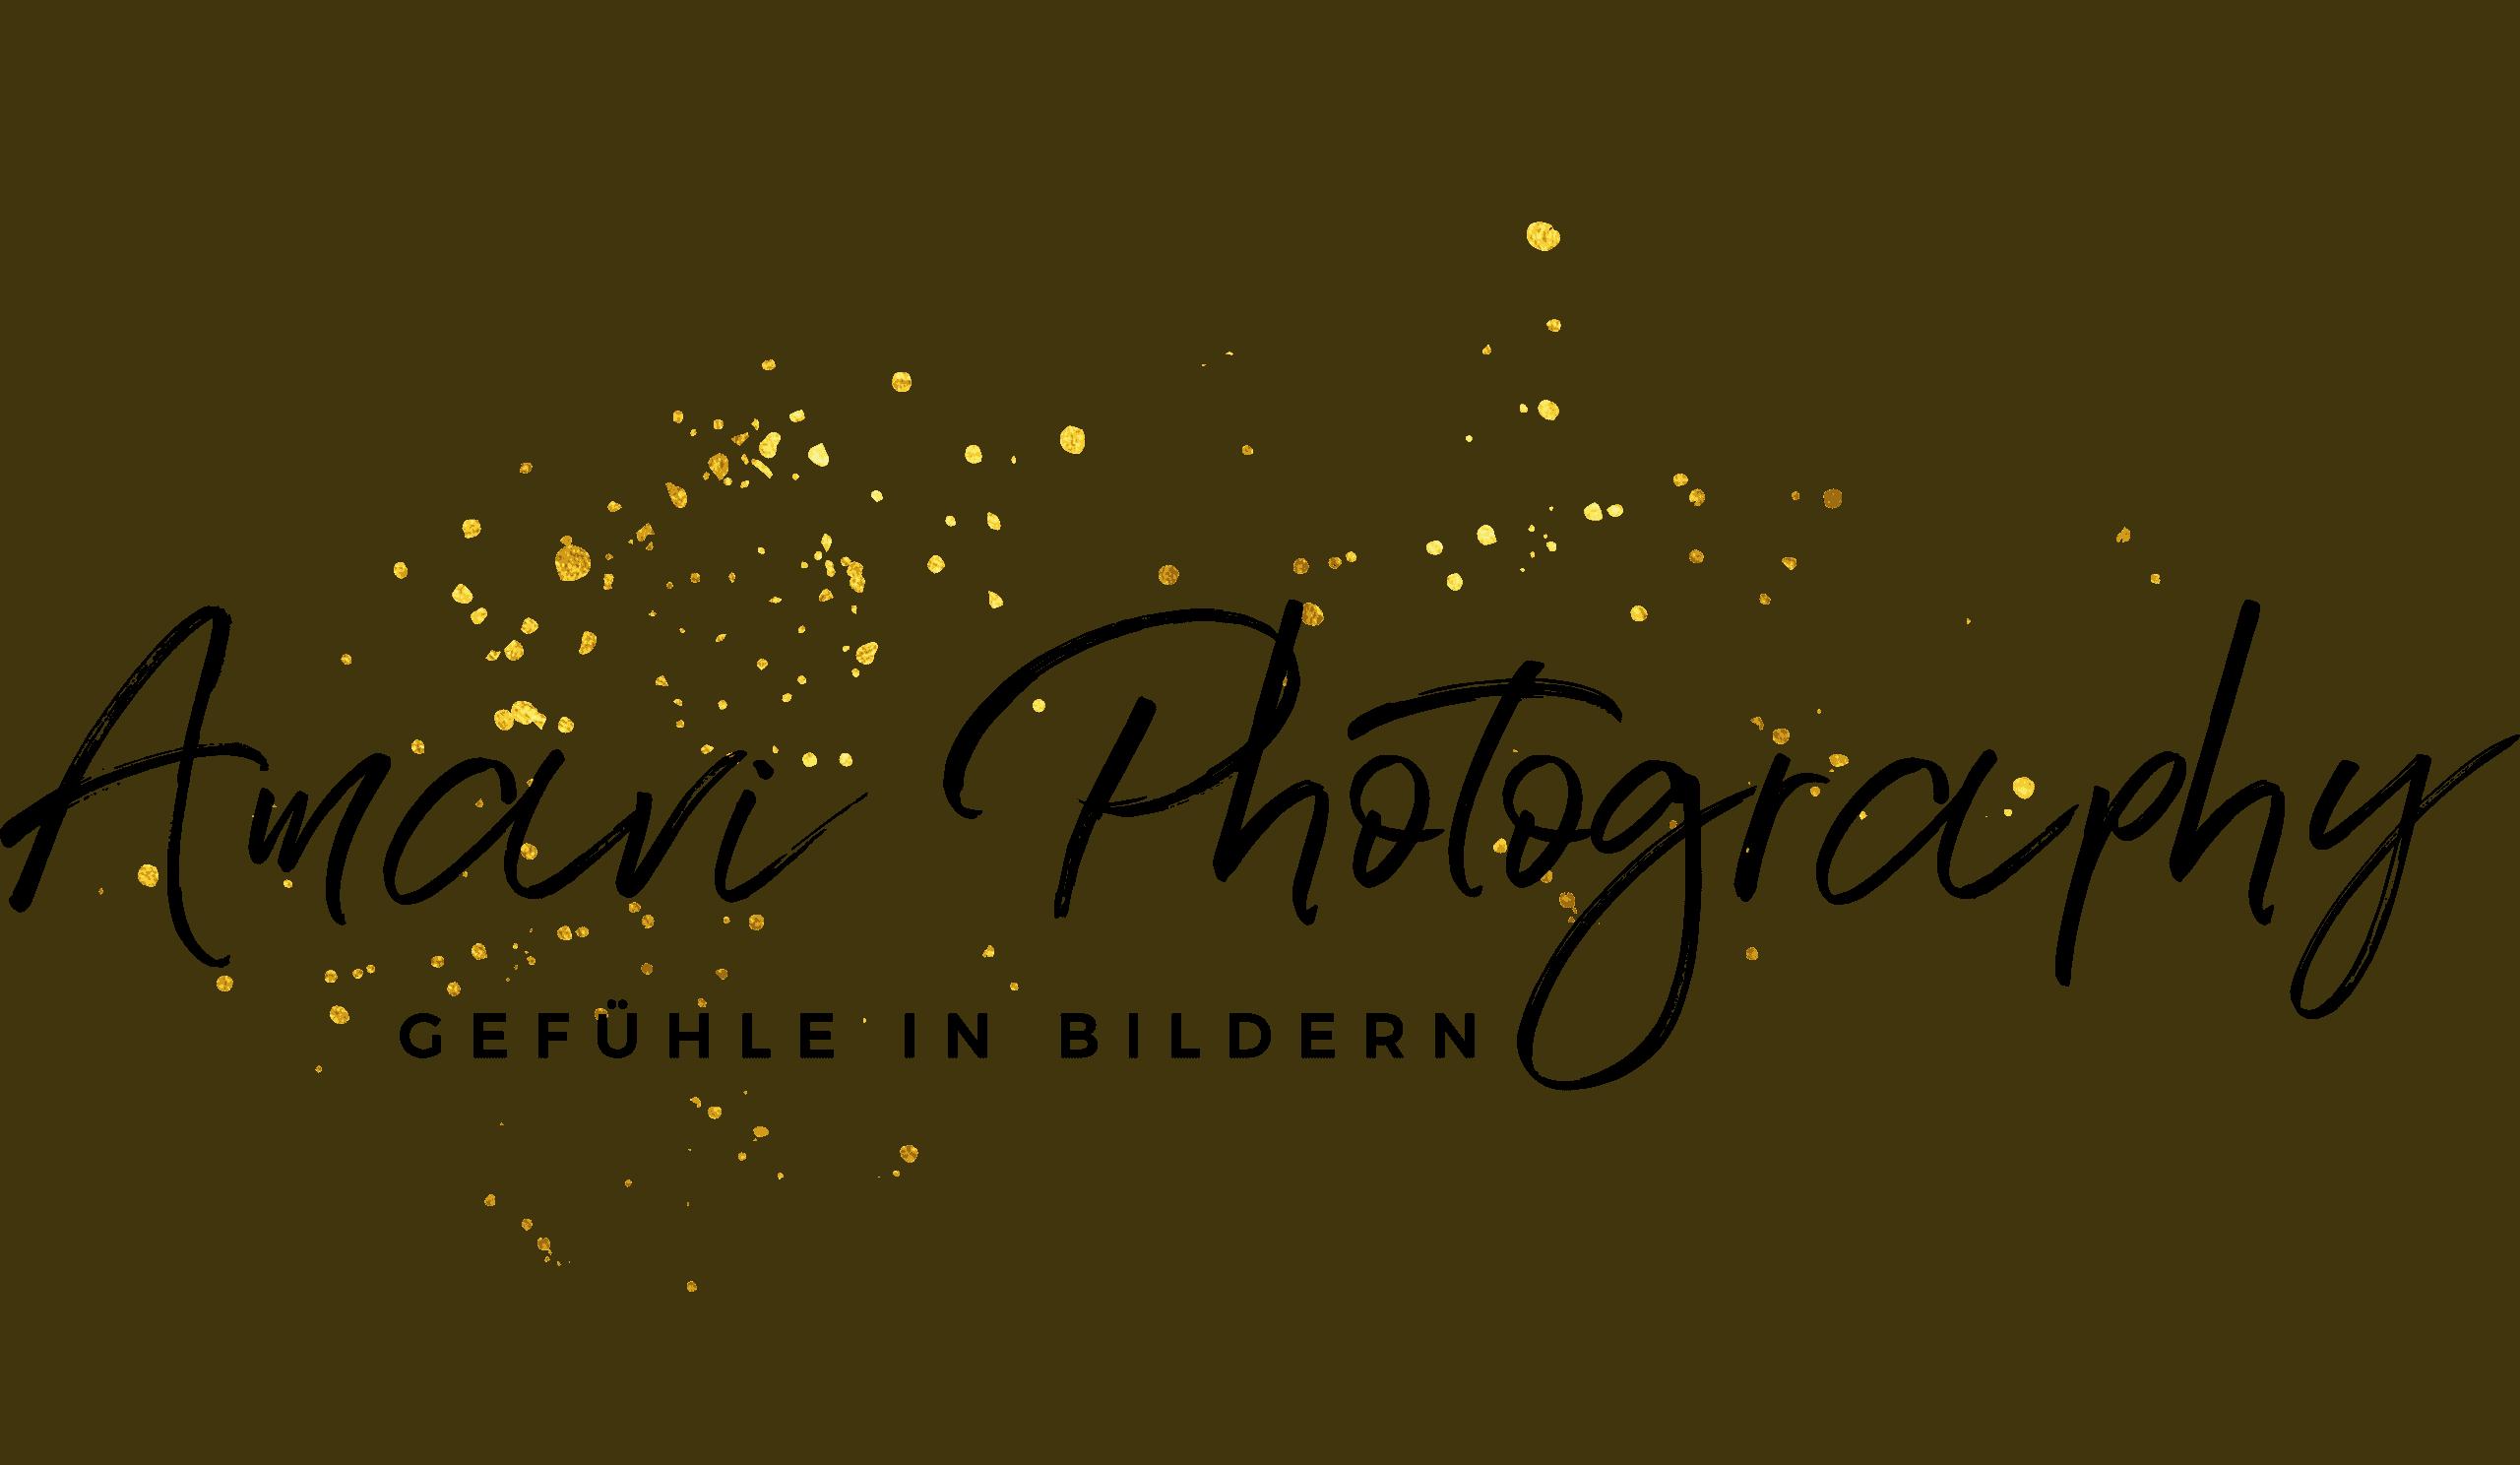 Hochzeitsfotografie & Familienfotografie aus Bremen :: Amavi Photography